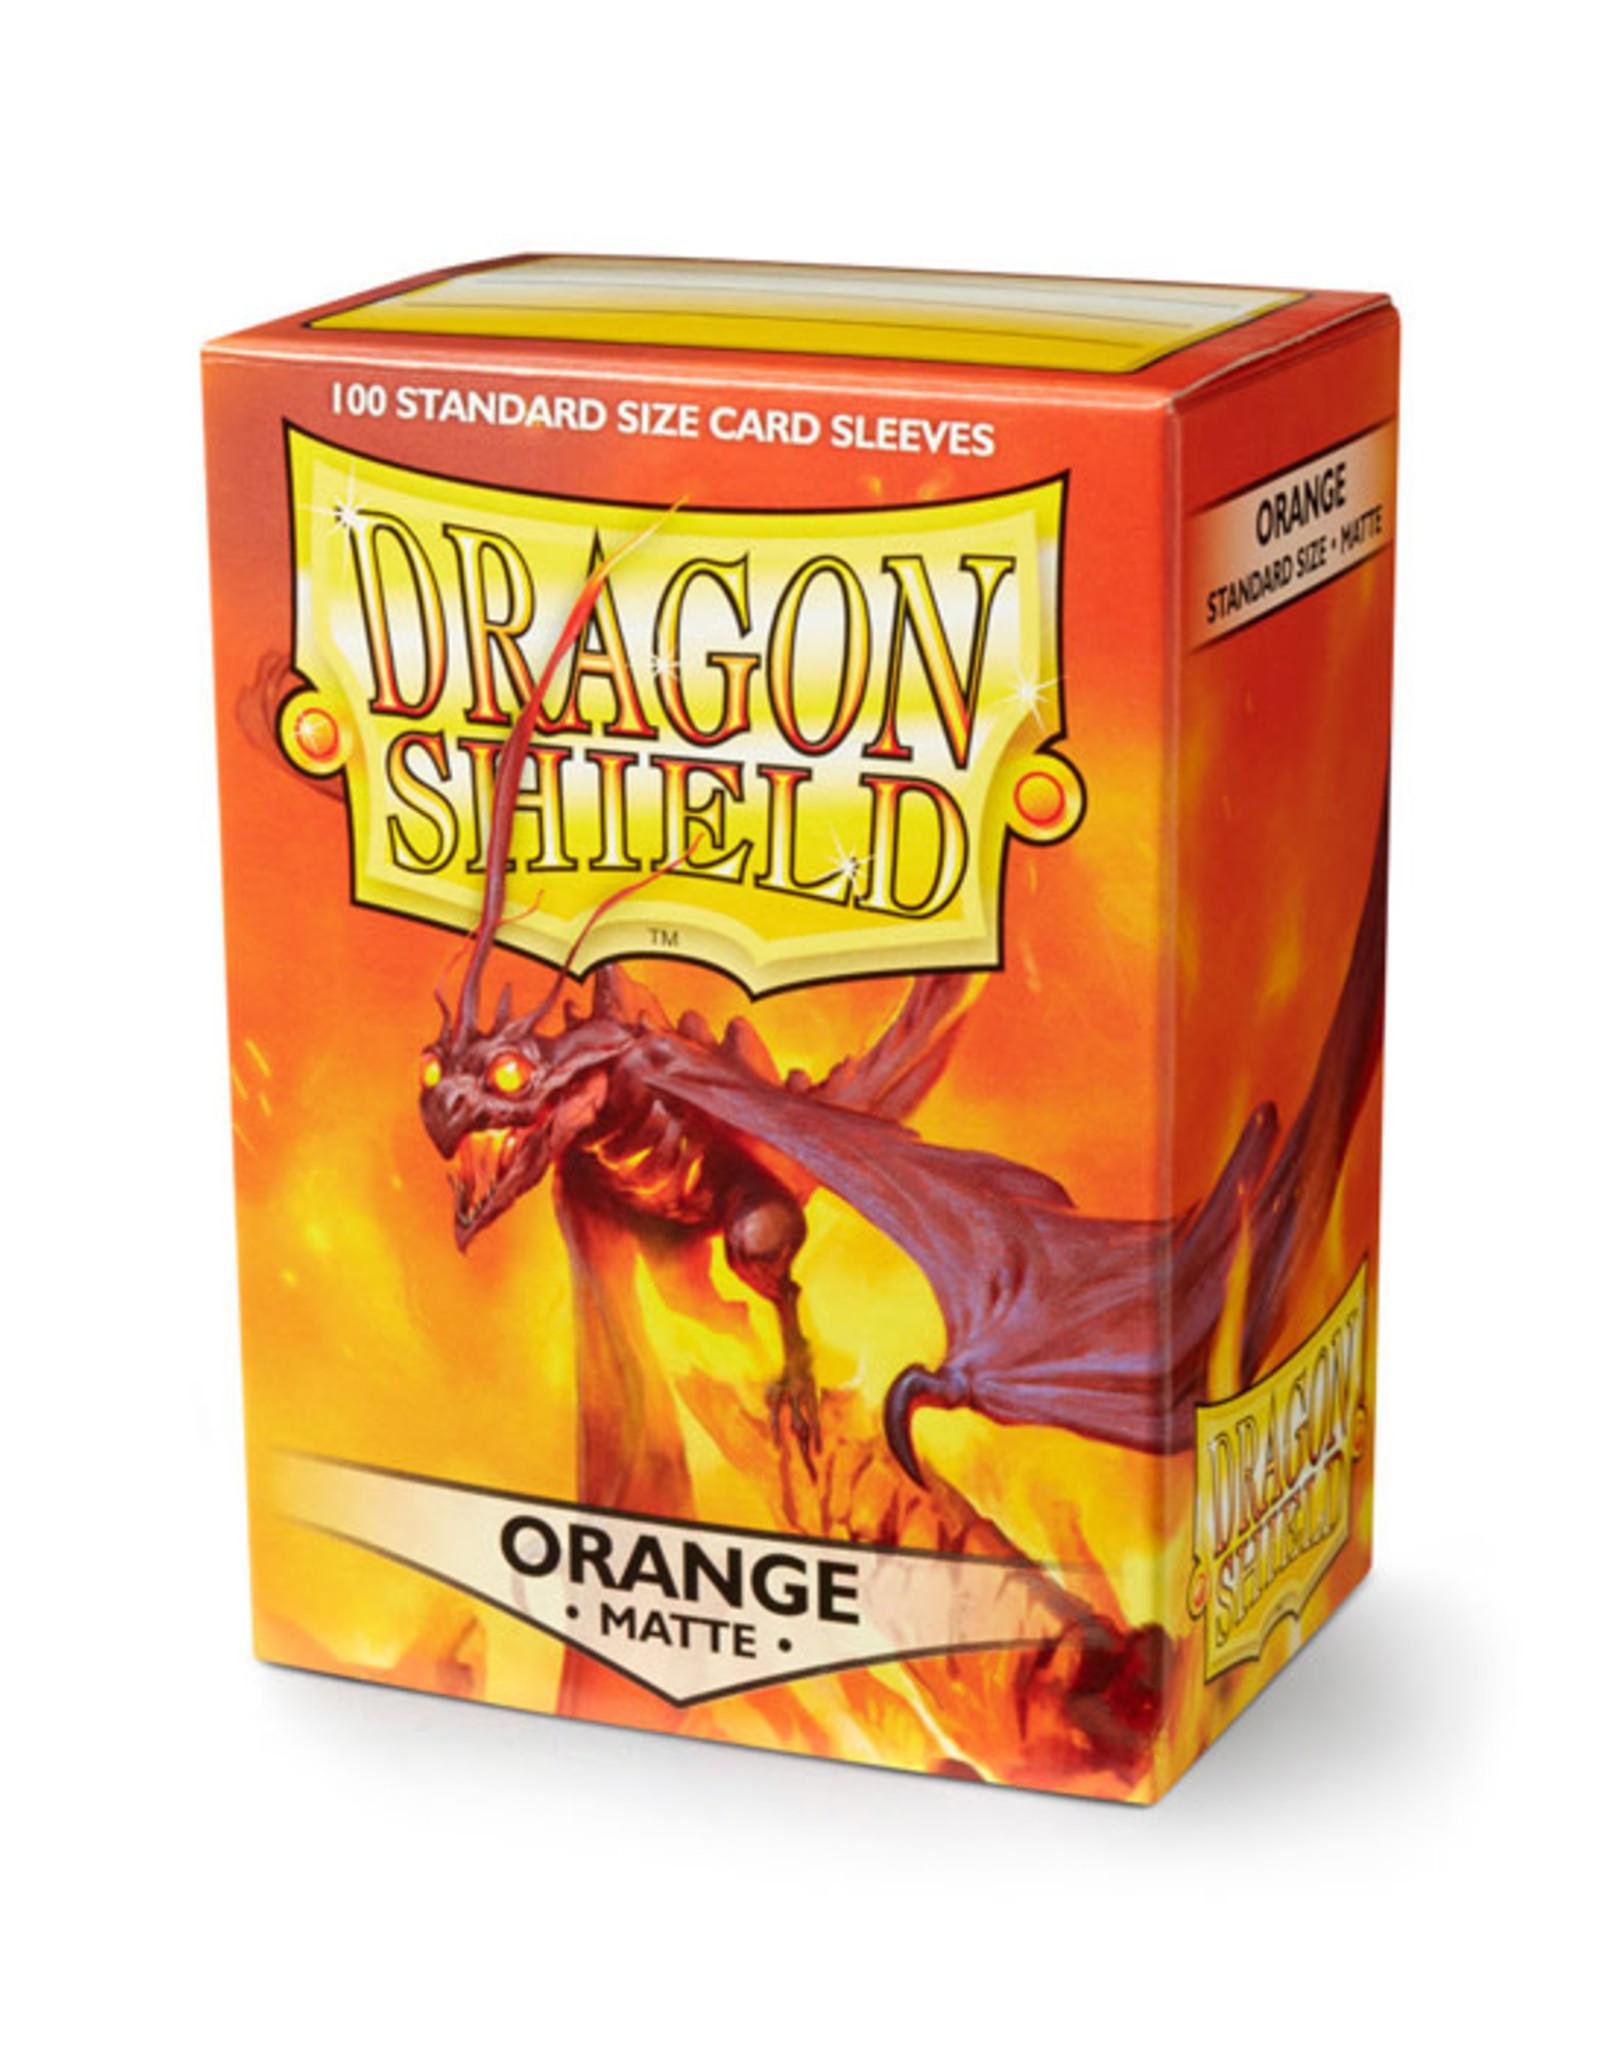 Dragon Shield Dragon Shield: Sleeves - Standard - Matte Orange (100)